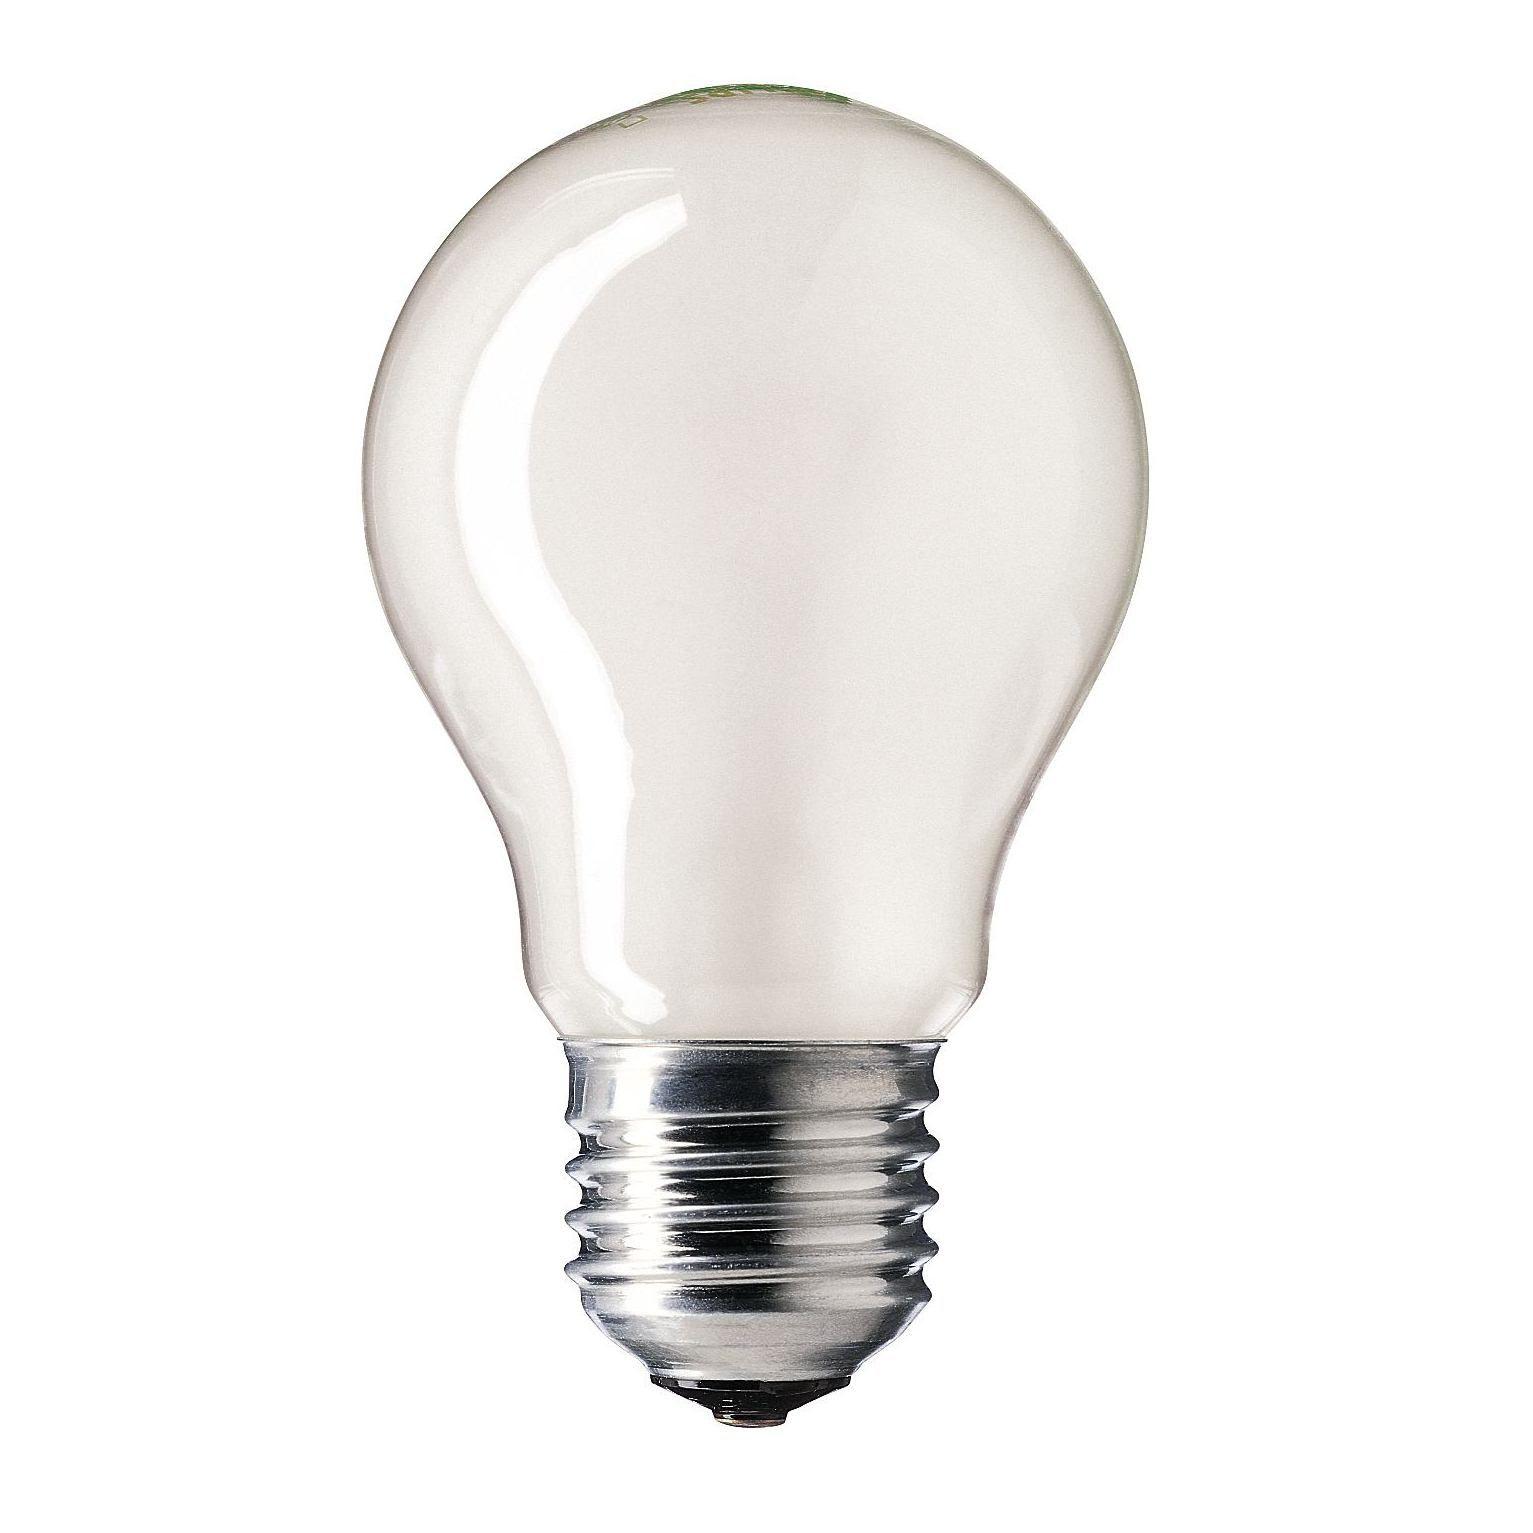 Купить Лампа накаливания Philips STANDARD 60W E27 230V A55 FR 1CT/12X10F Pila матовая